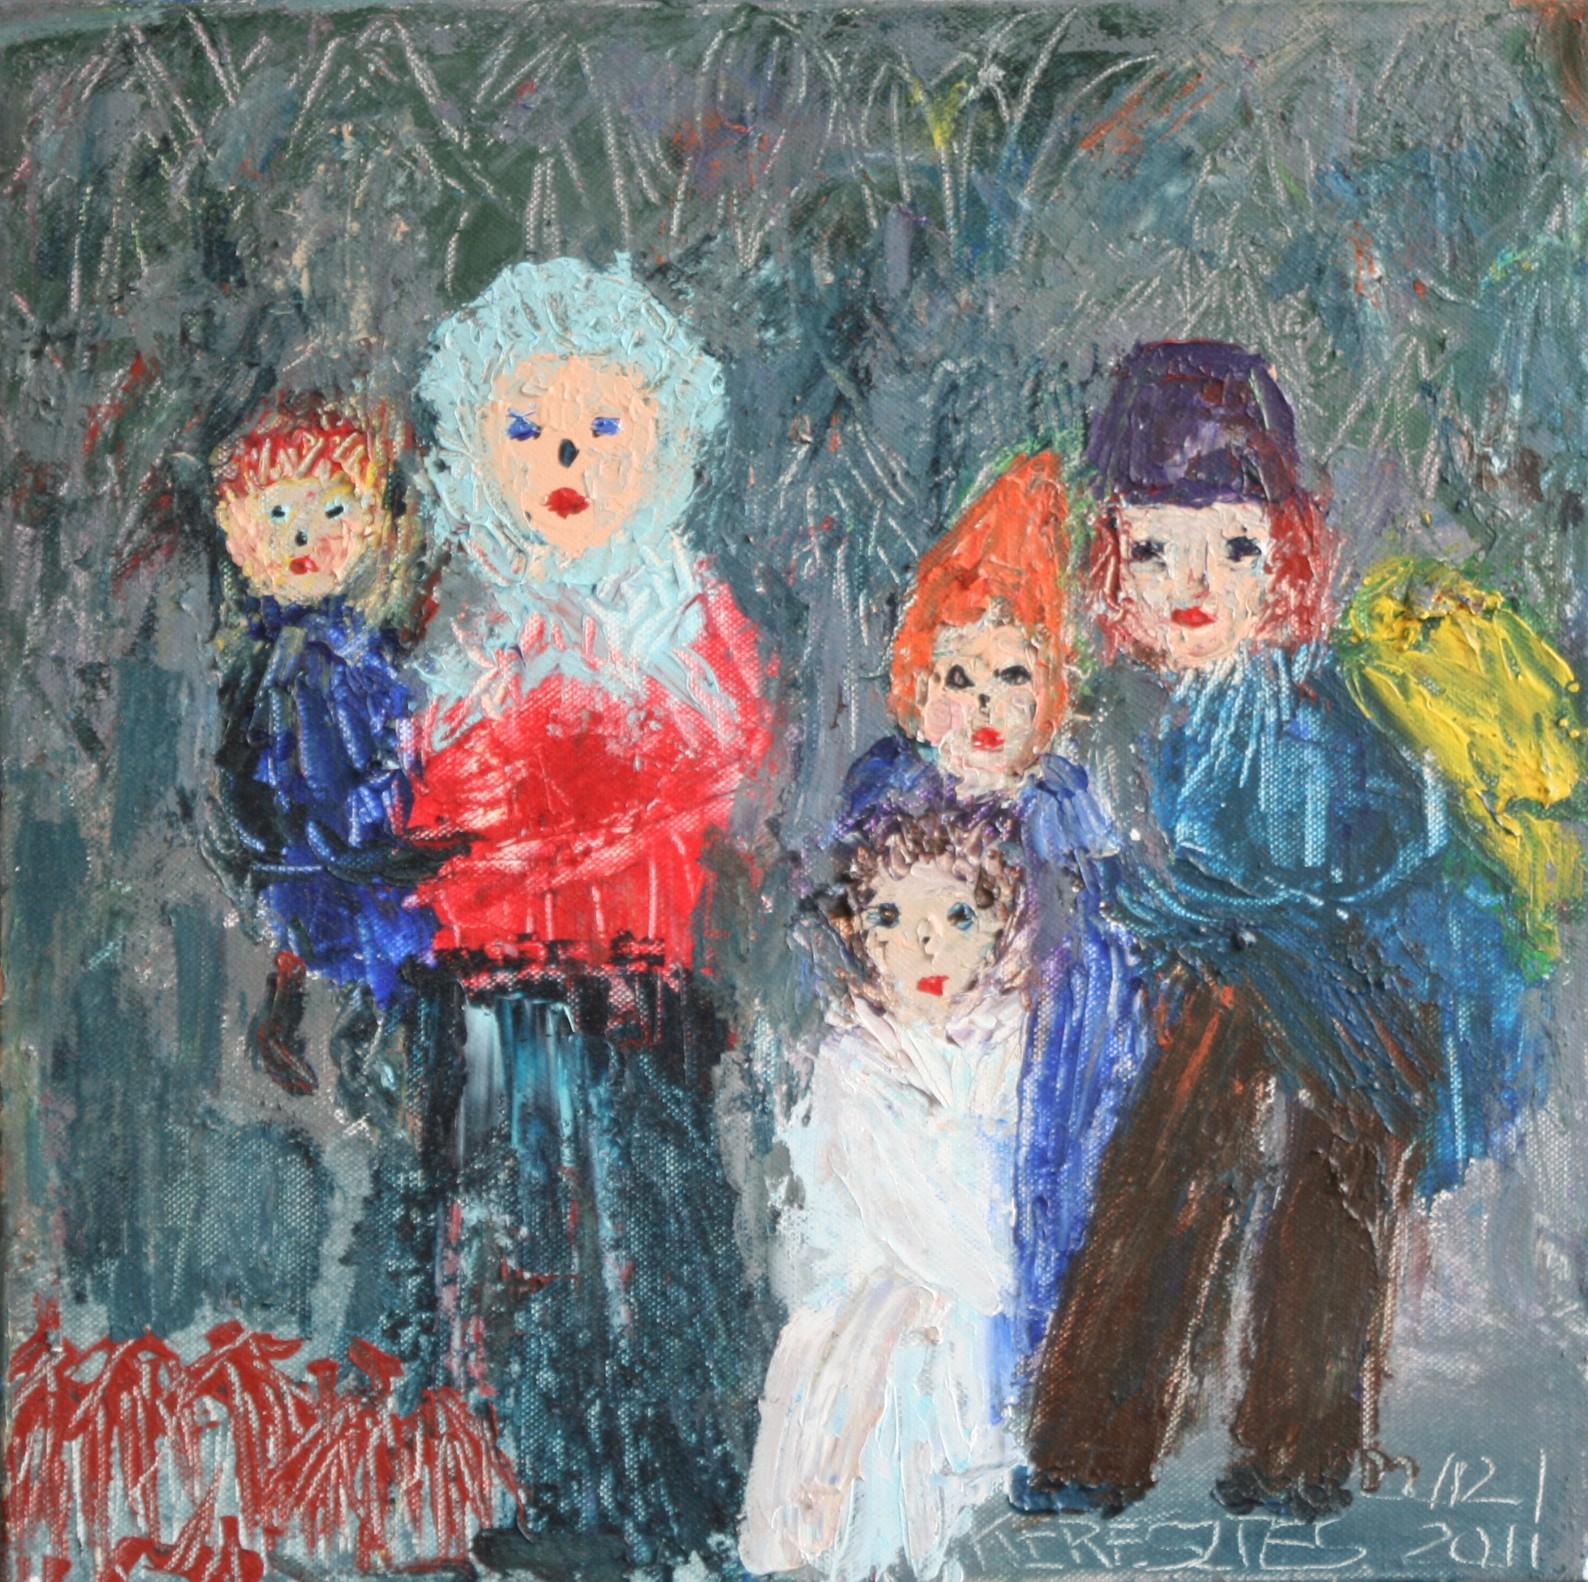 toile 51 - magdalena keresztes, artiste peintre à amiens